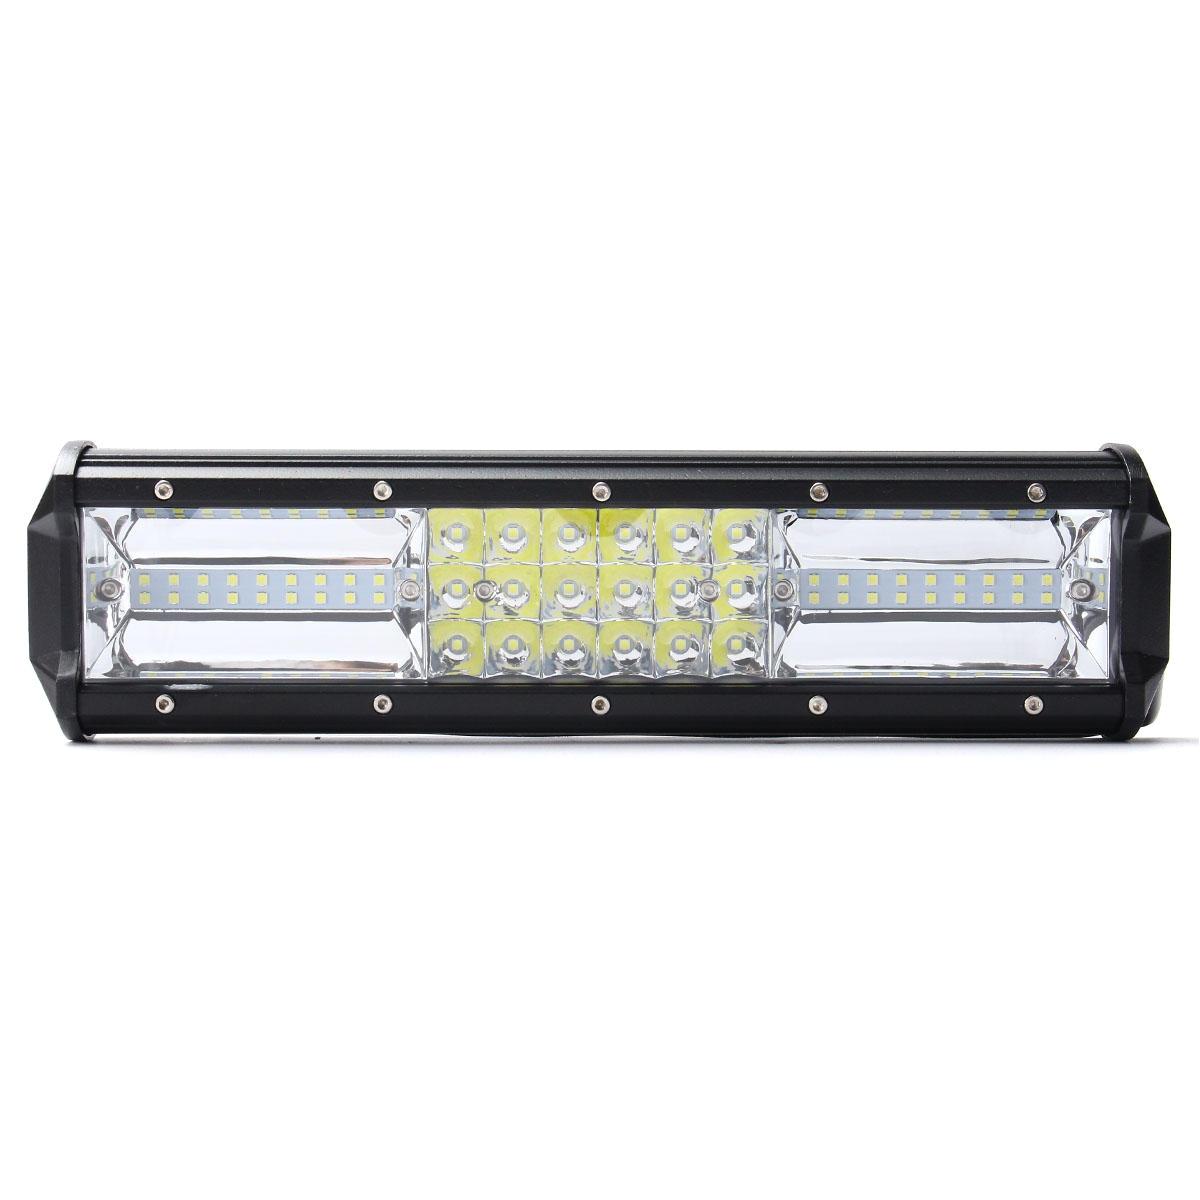 12 inch 324w led light bar flood spot combo off road car truck 10 30v